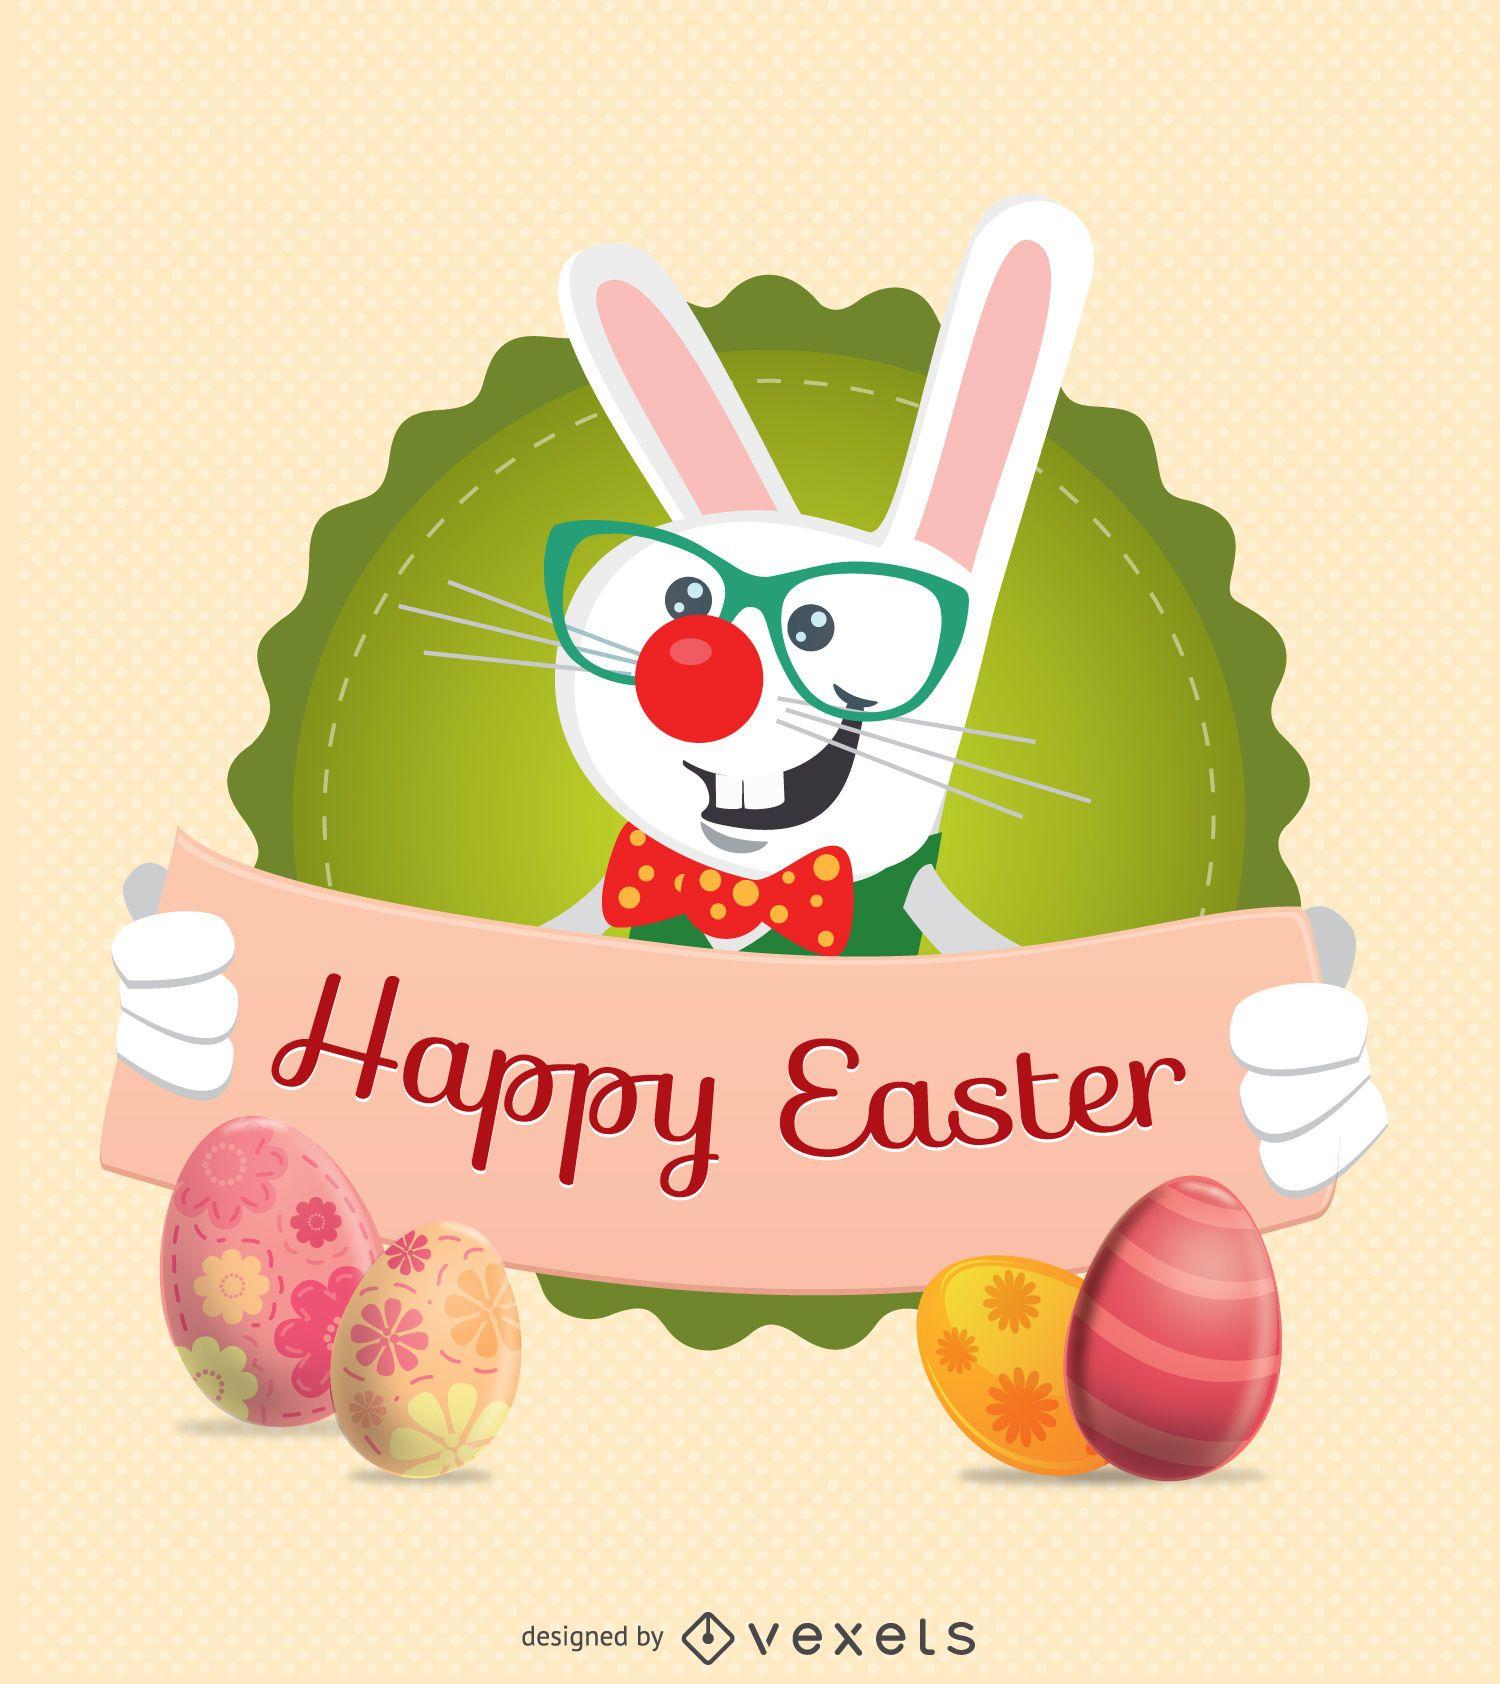 Carácter de conejo de Pascua con mensaje de cinta